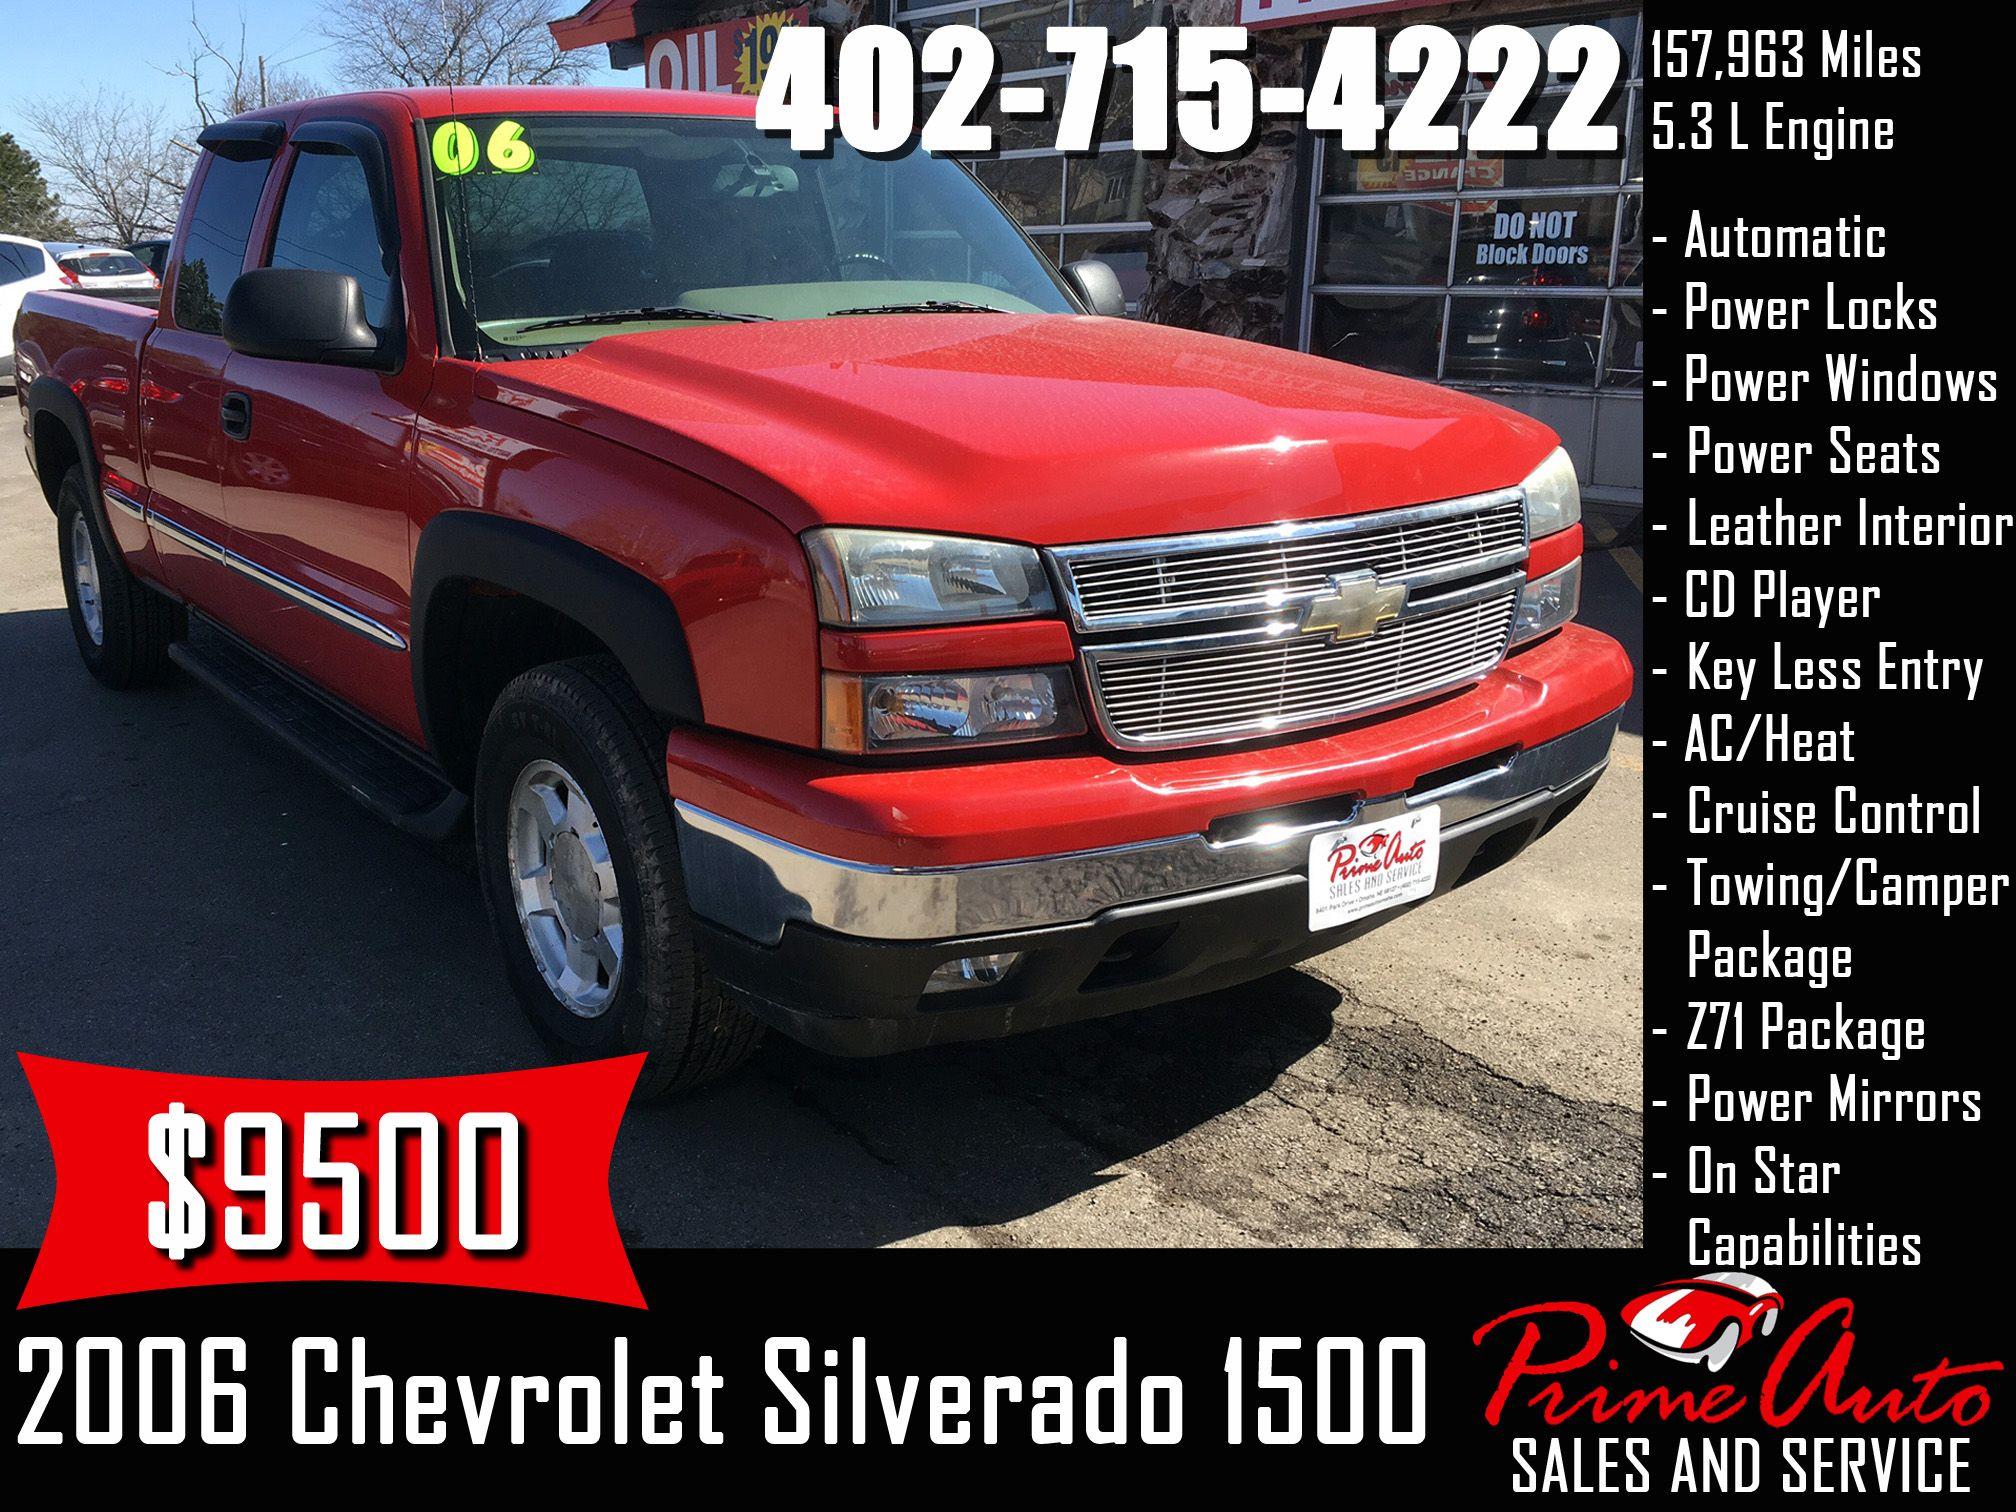 2006 Chevrolet Silverado 1500 Lt Call Us Today 402 715 4222